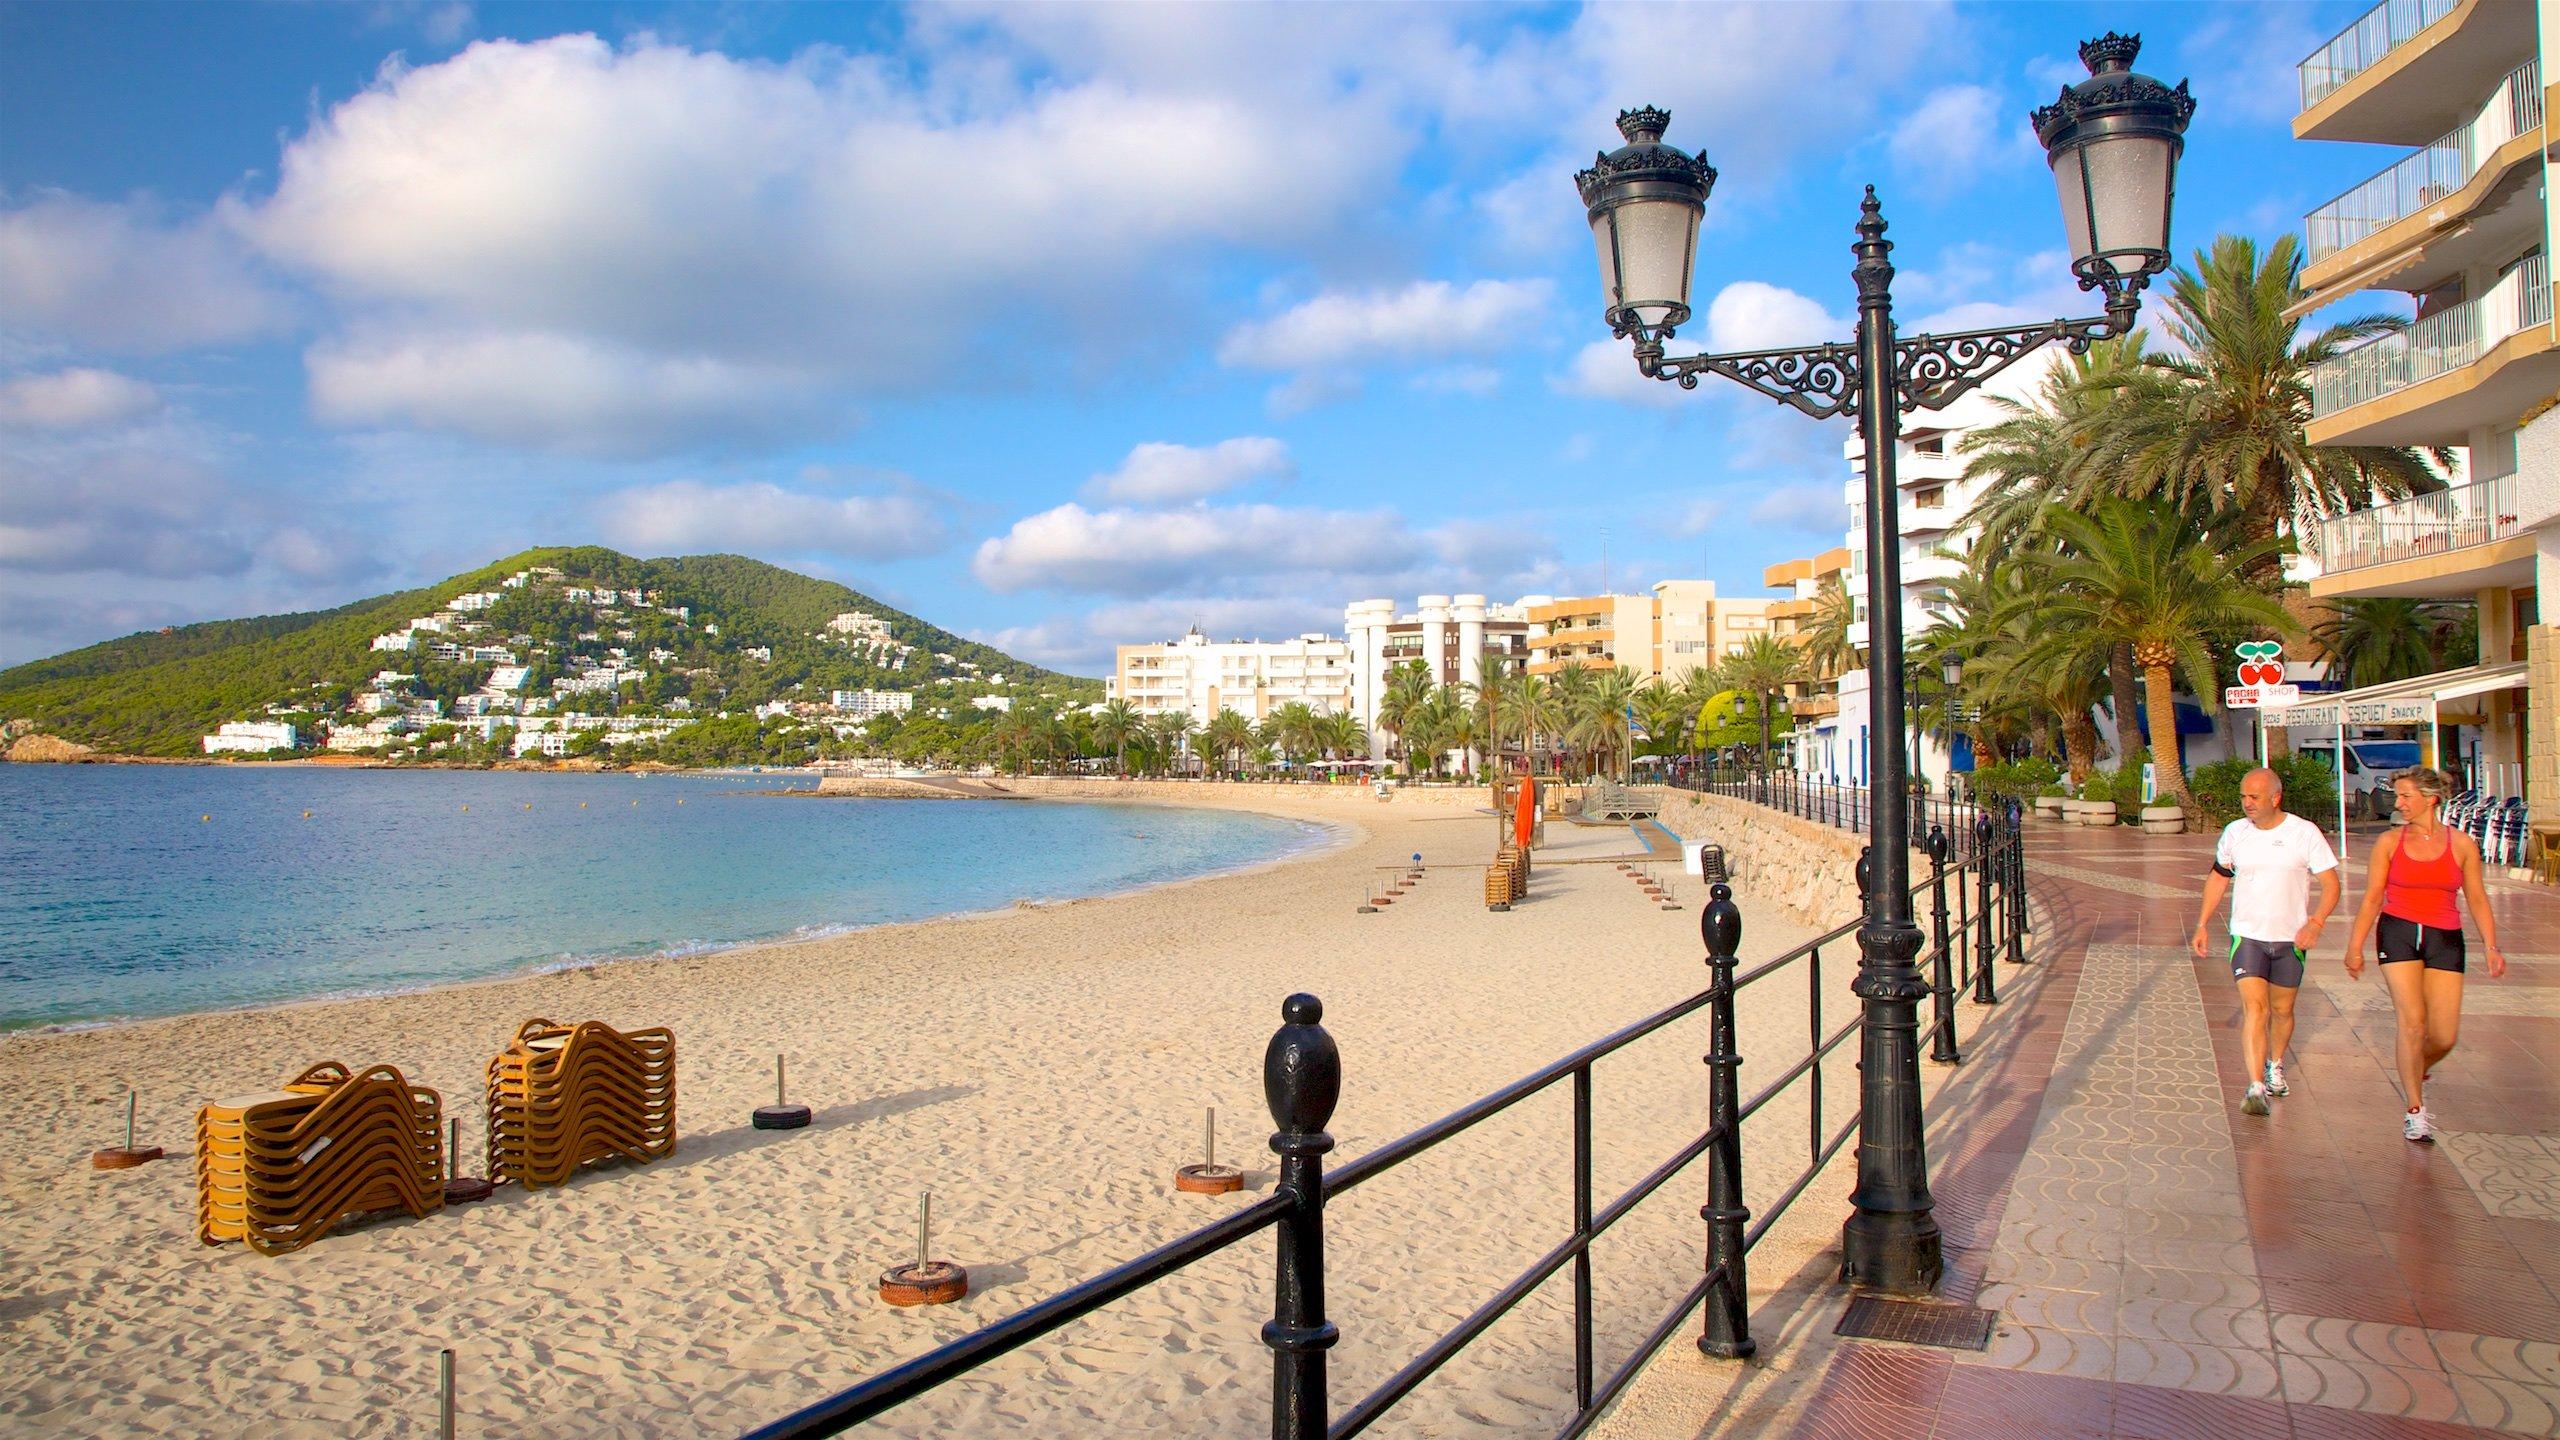 Santa Eulalia del Rio, Balearic Islands, Spain